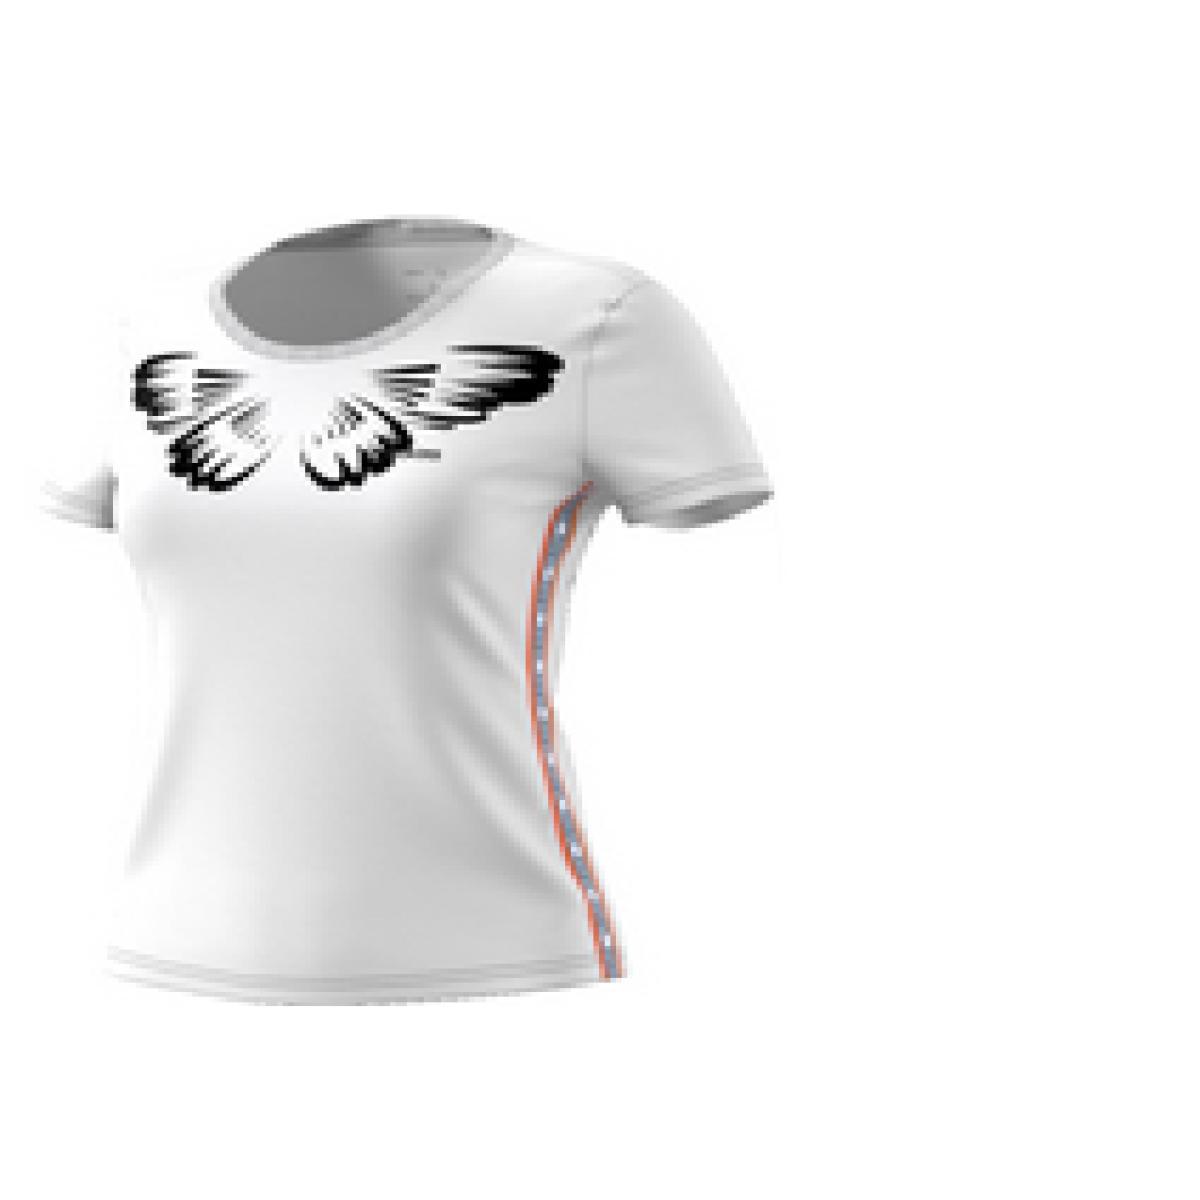 T-shirt Feminino Adidas Ei4830 w Farm p Off White